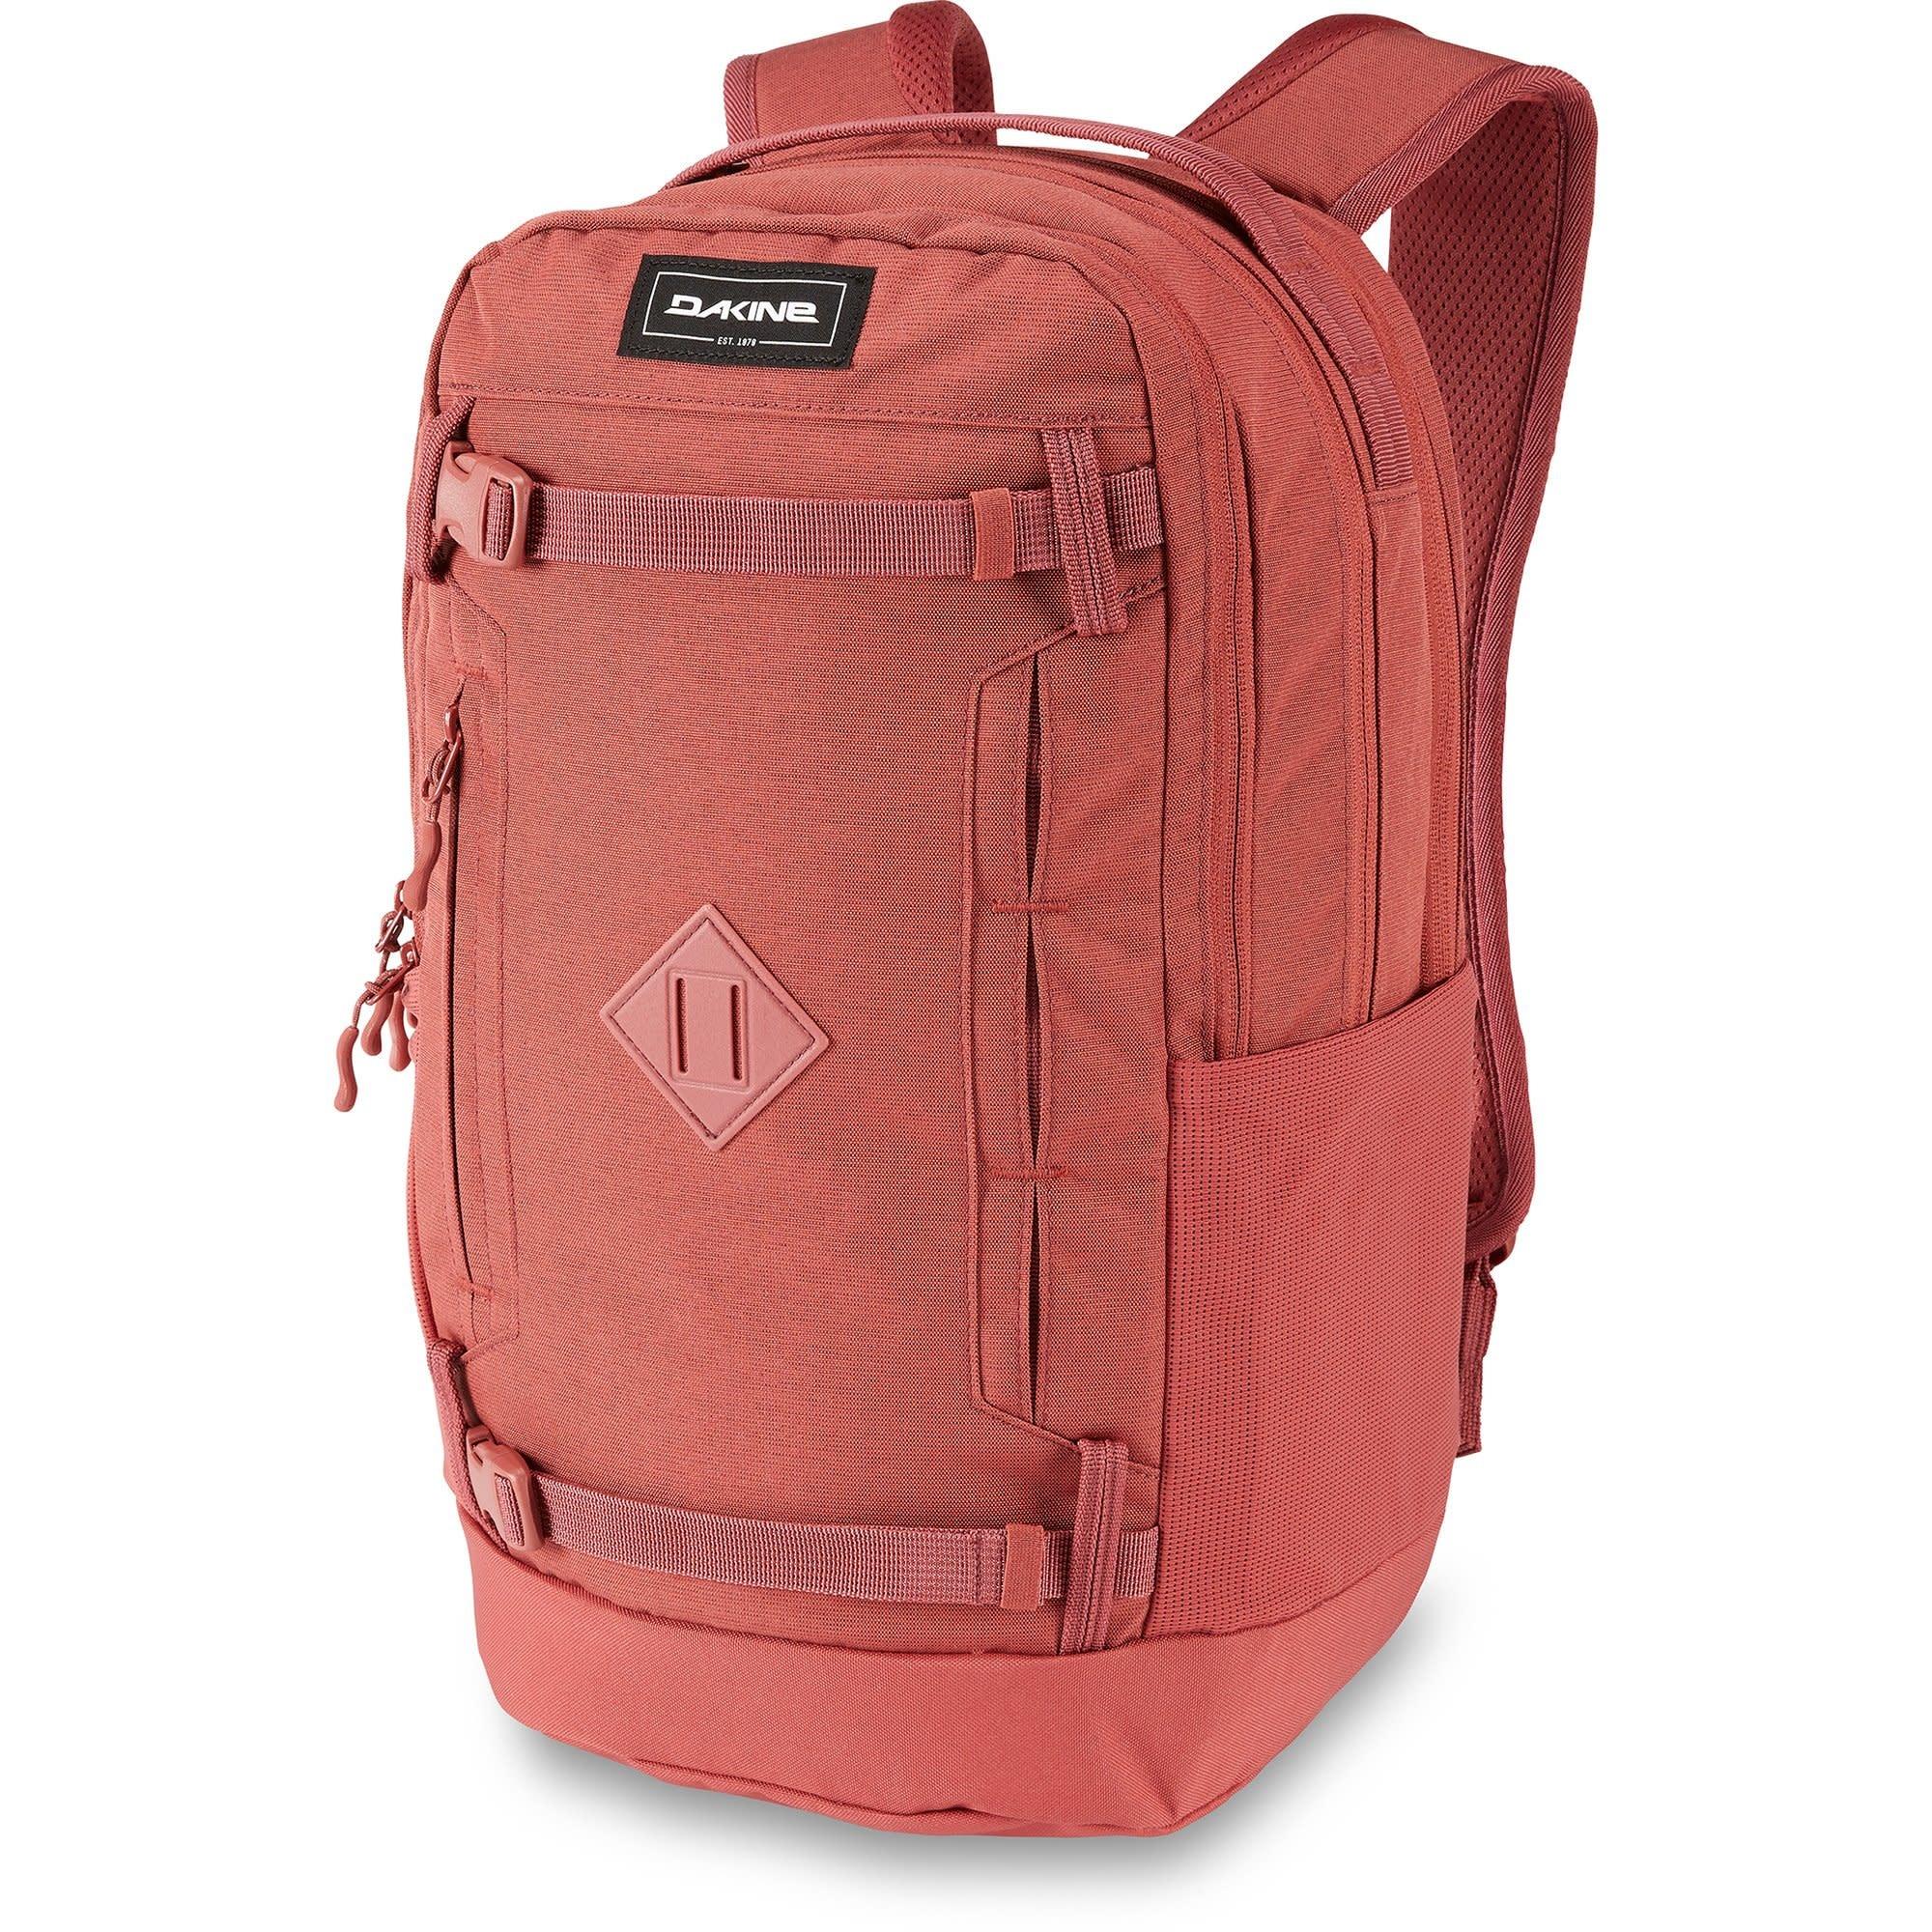 Dakine Dakine URBN Mission 23L Backpack